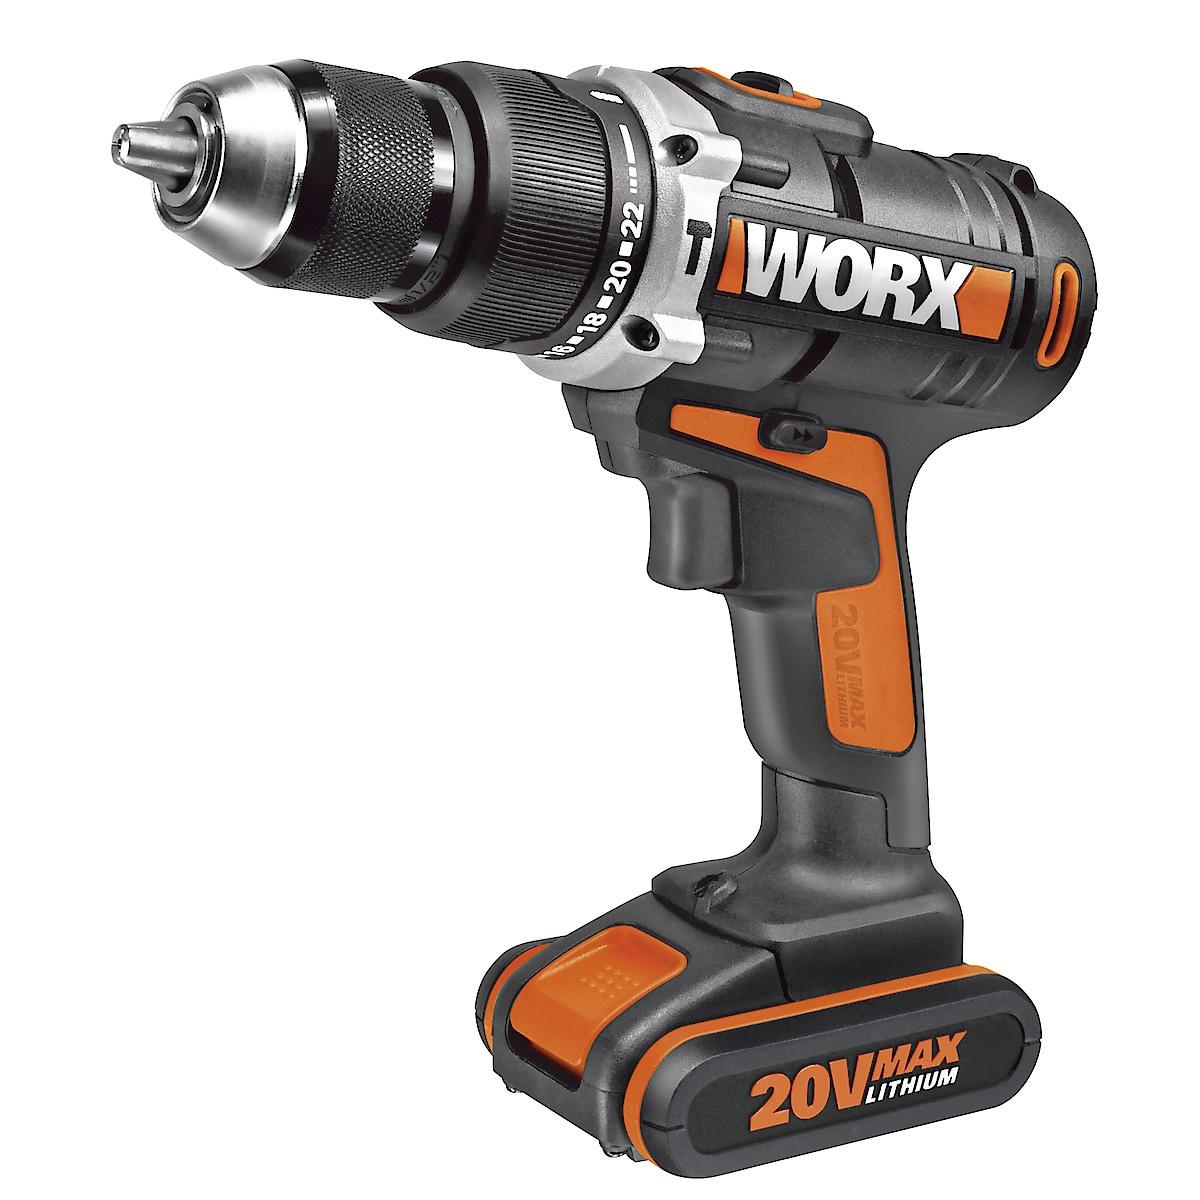 Worx WX372 Hammer Drill Driver